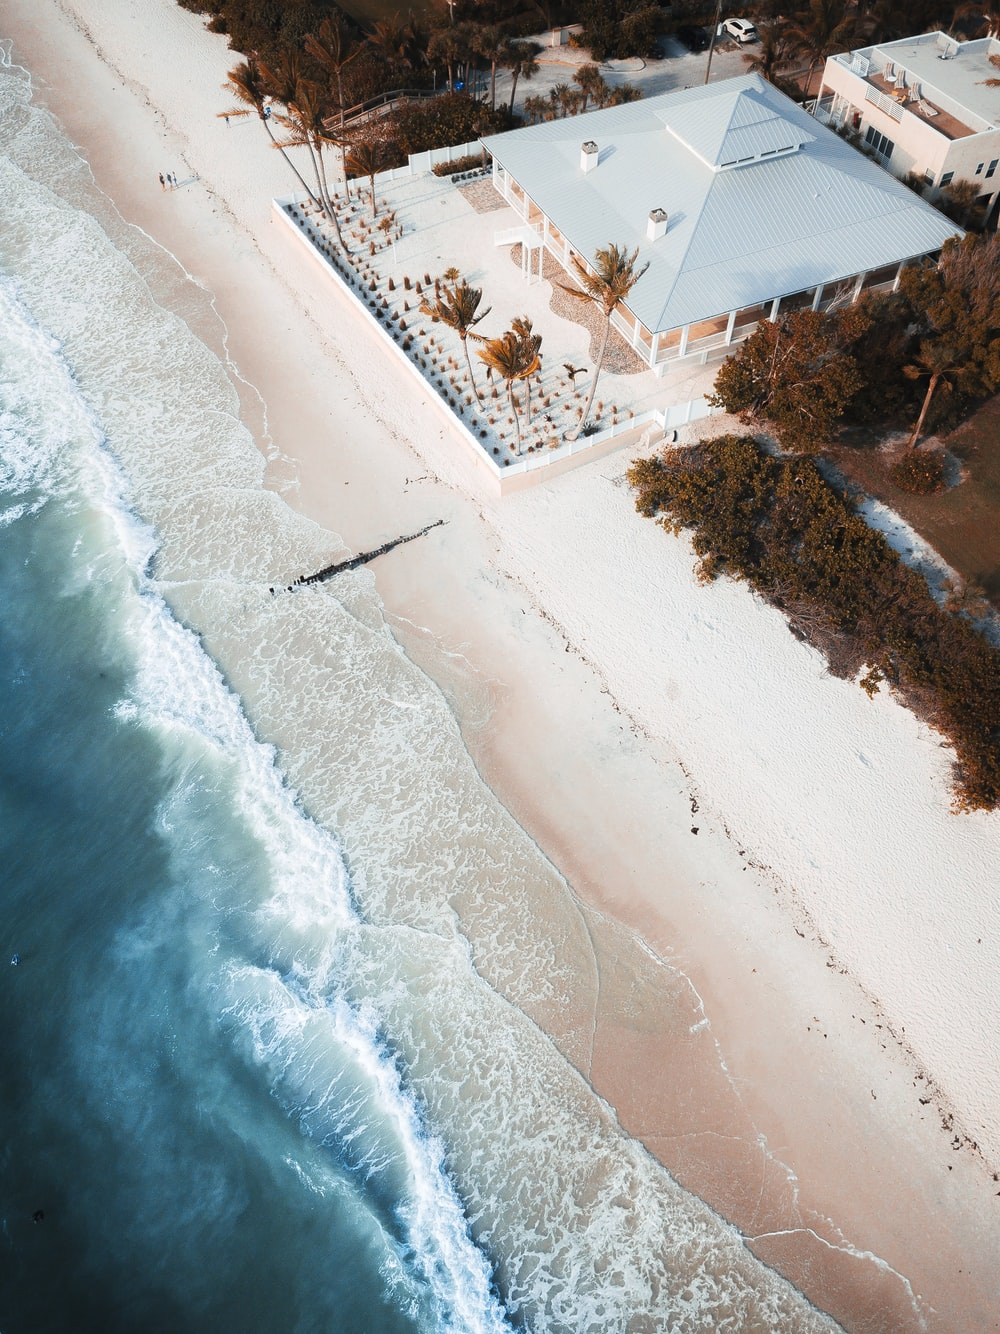 aerial photo of gray house near beach